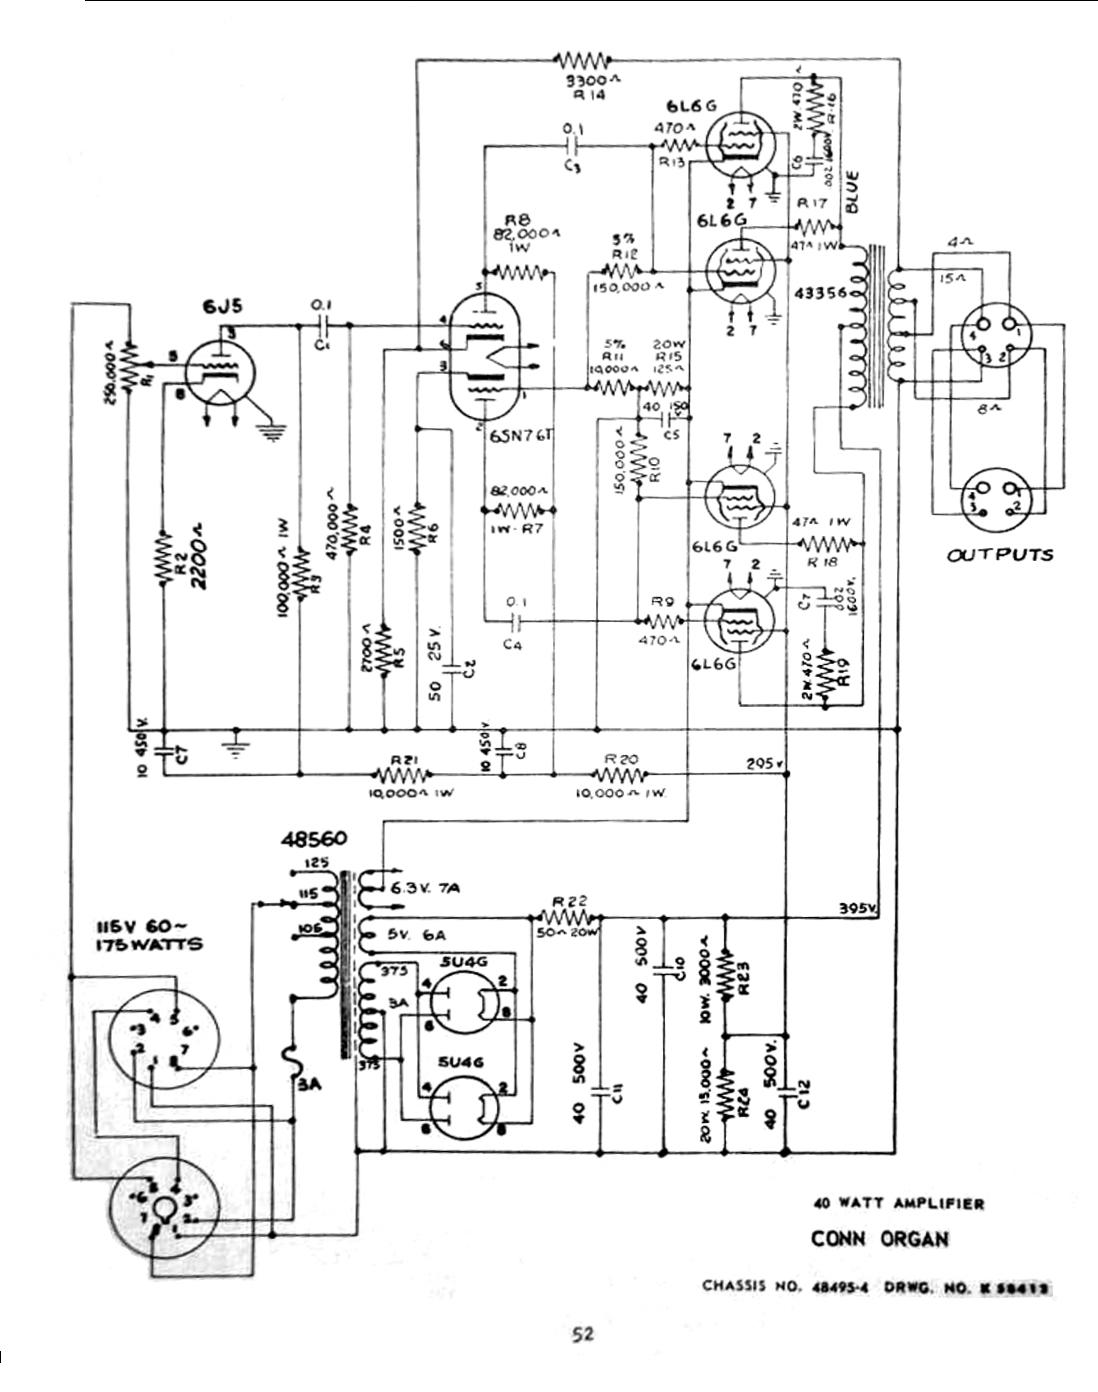 Vintage Electronics Book Conn 40 Watt